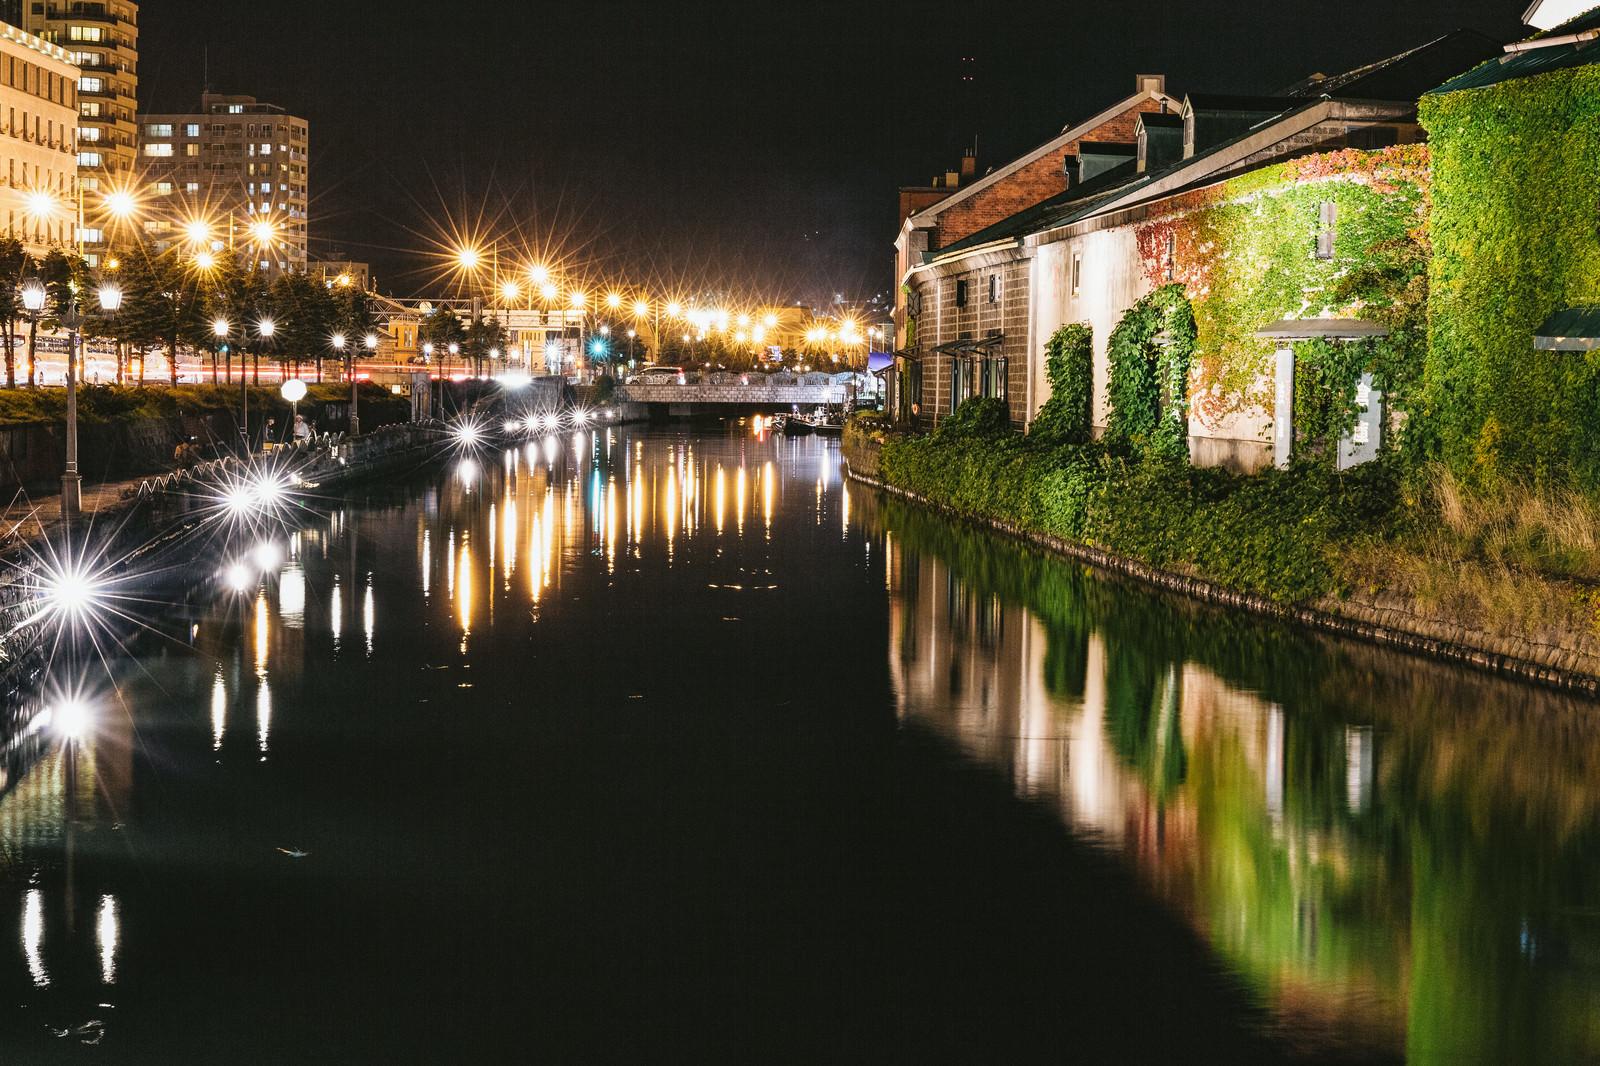 「小樽東運河(夜景)小樽東運河(夜景)」のフリー写真素材を拡大